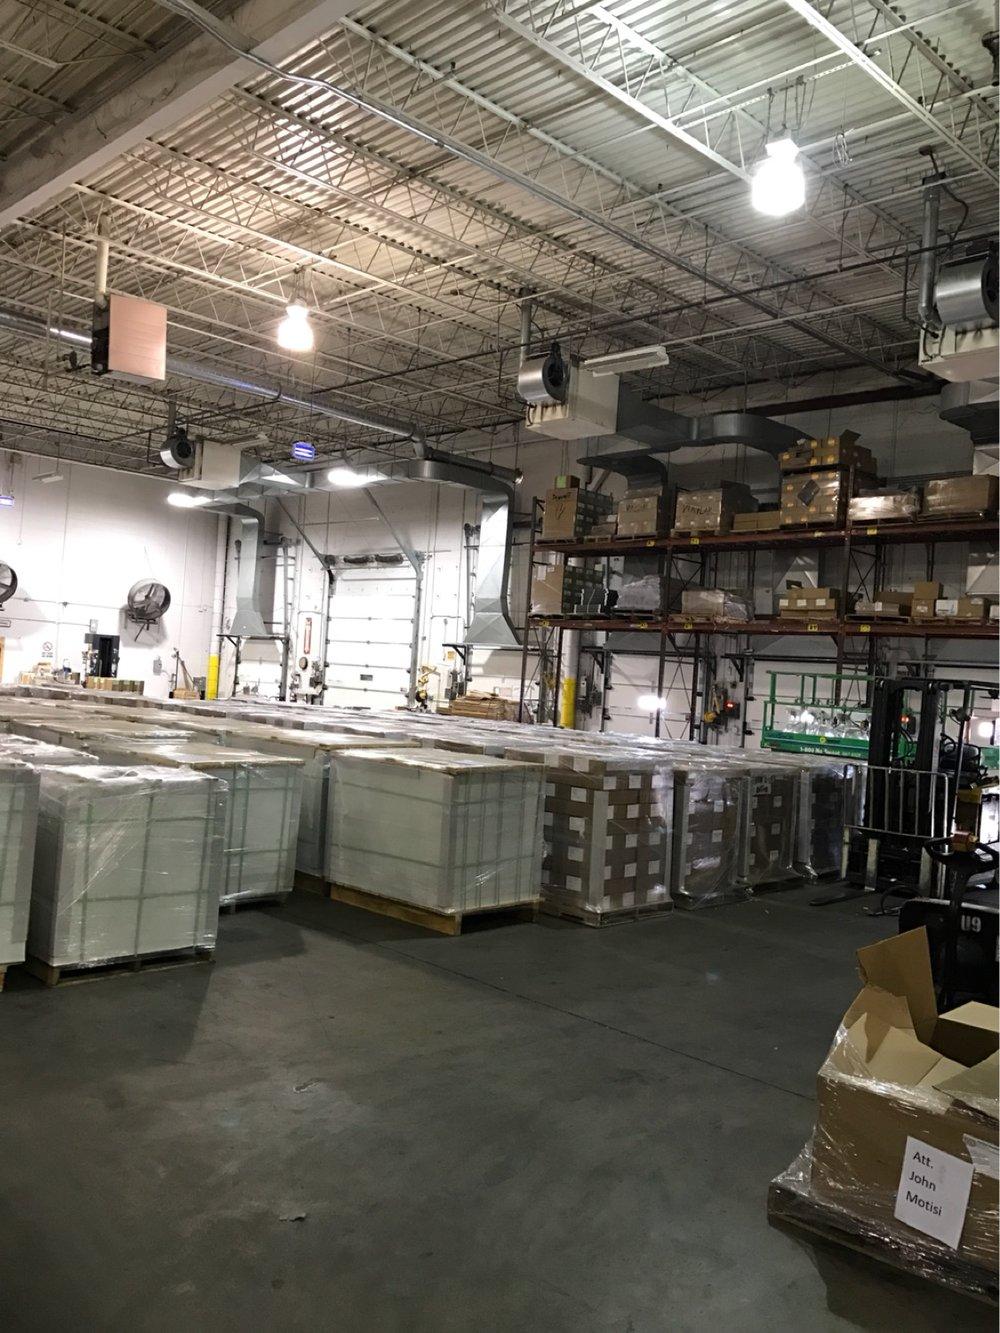 Unimac Graphics LED Lighting Retrofit - Albright Energy Solutions - Albright Electric - Mahwah NJ (2).jpeg